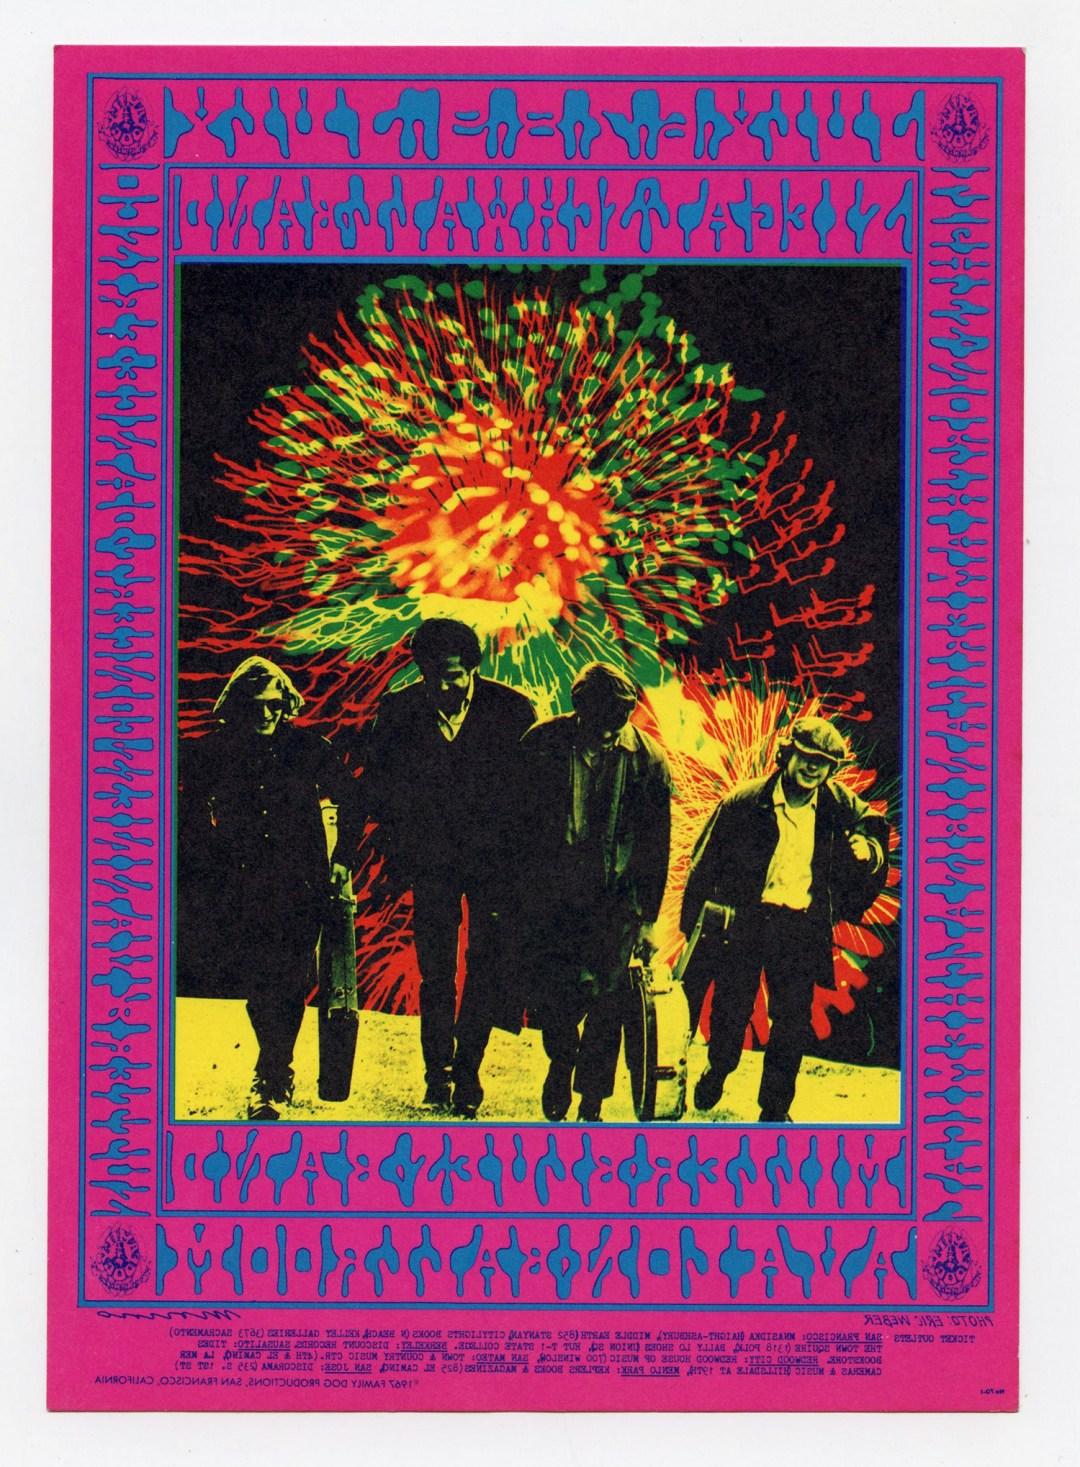 Family Dog 070 Postcard Chicago Fire 1967 Jul 6 Siegal Schwall Steve Miller